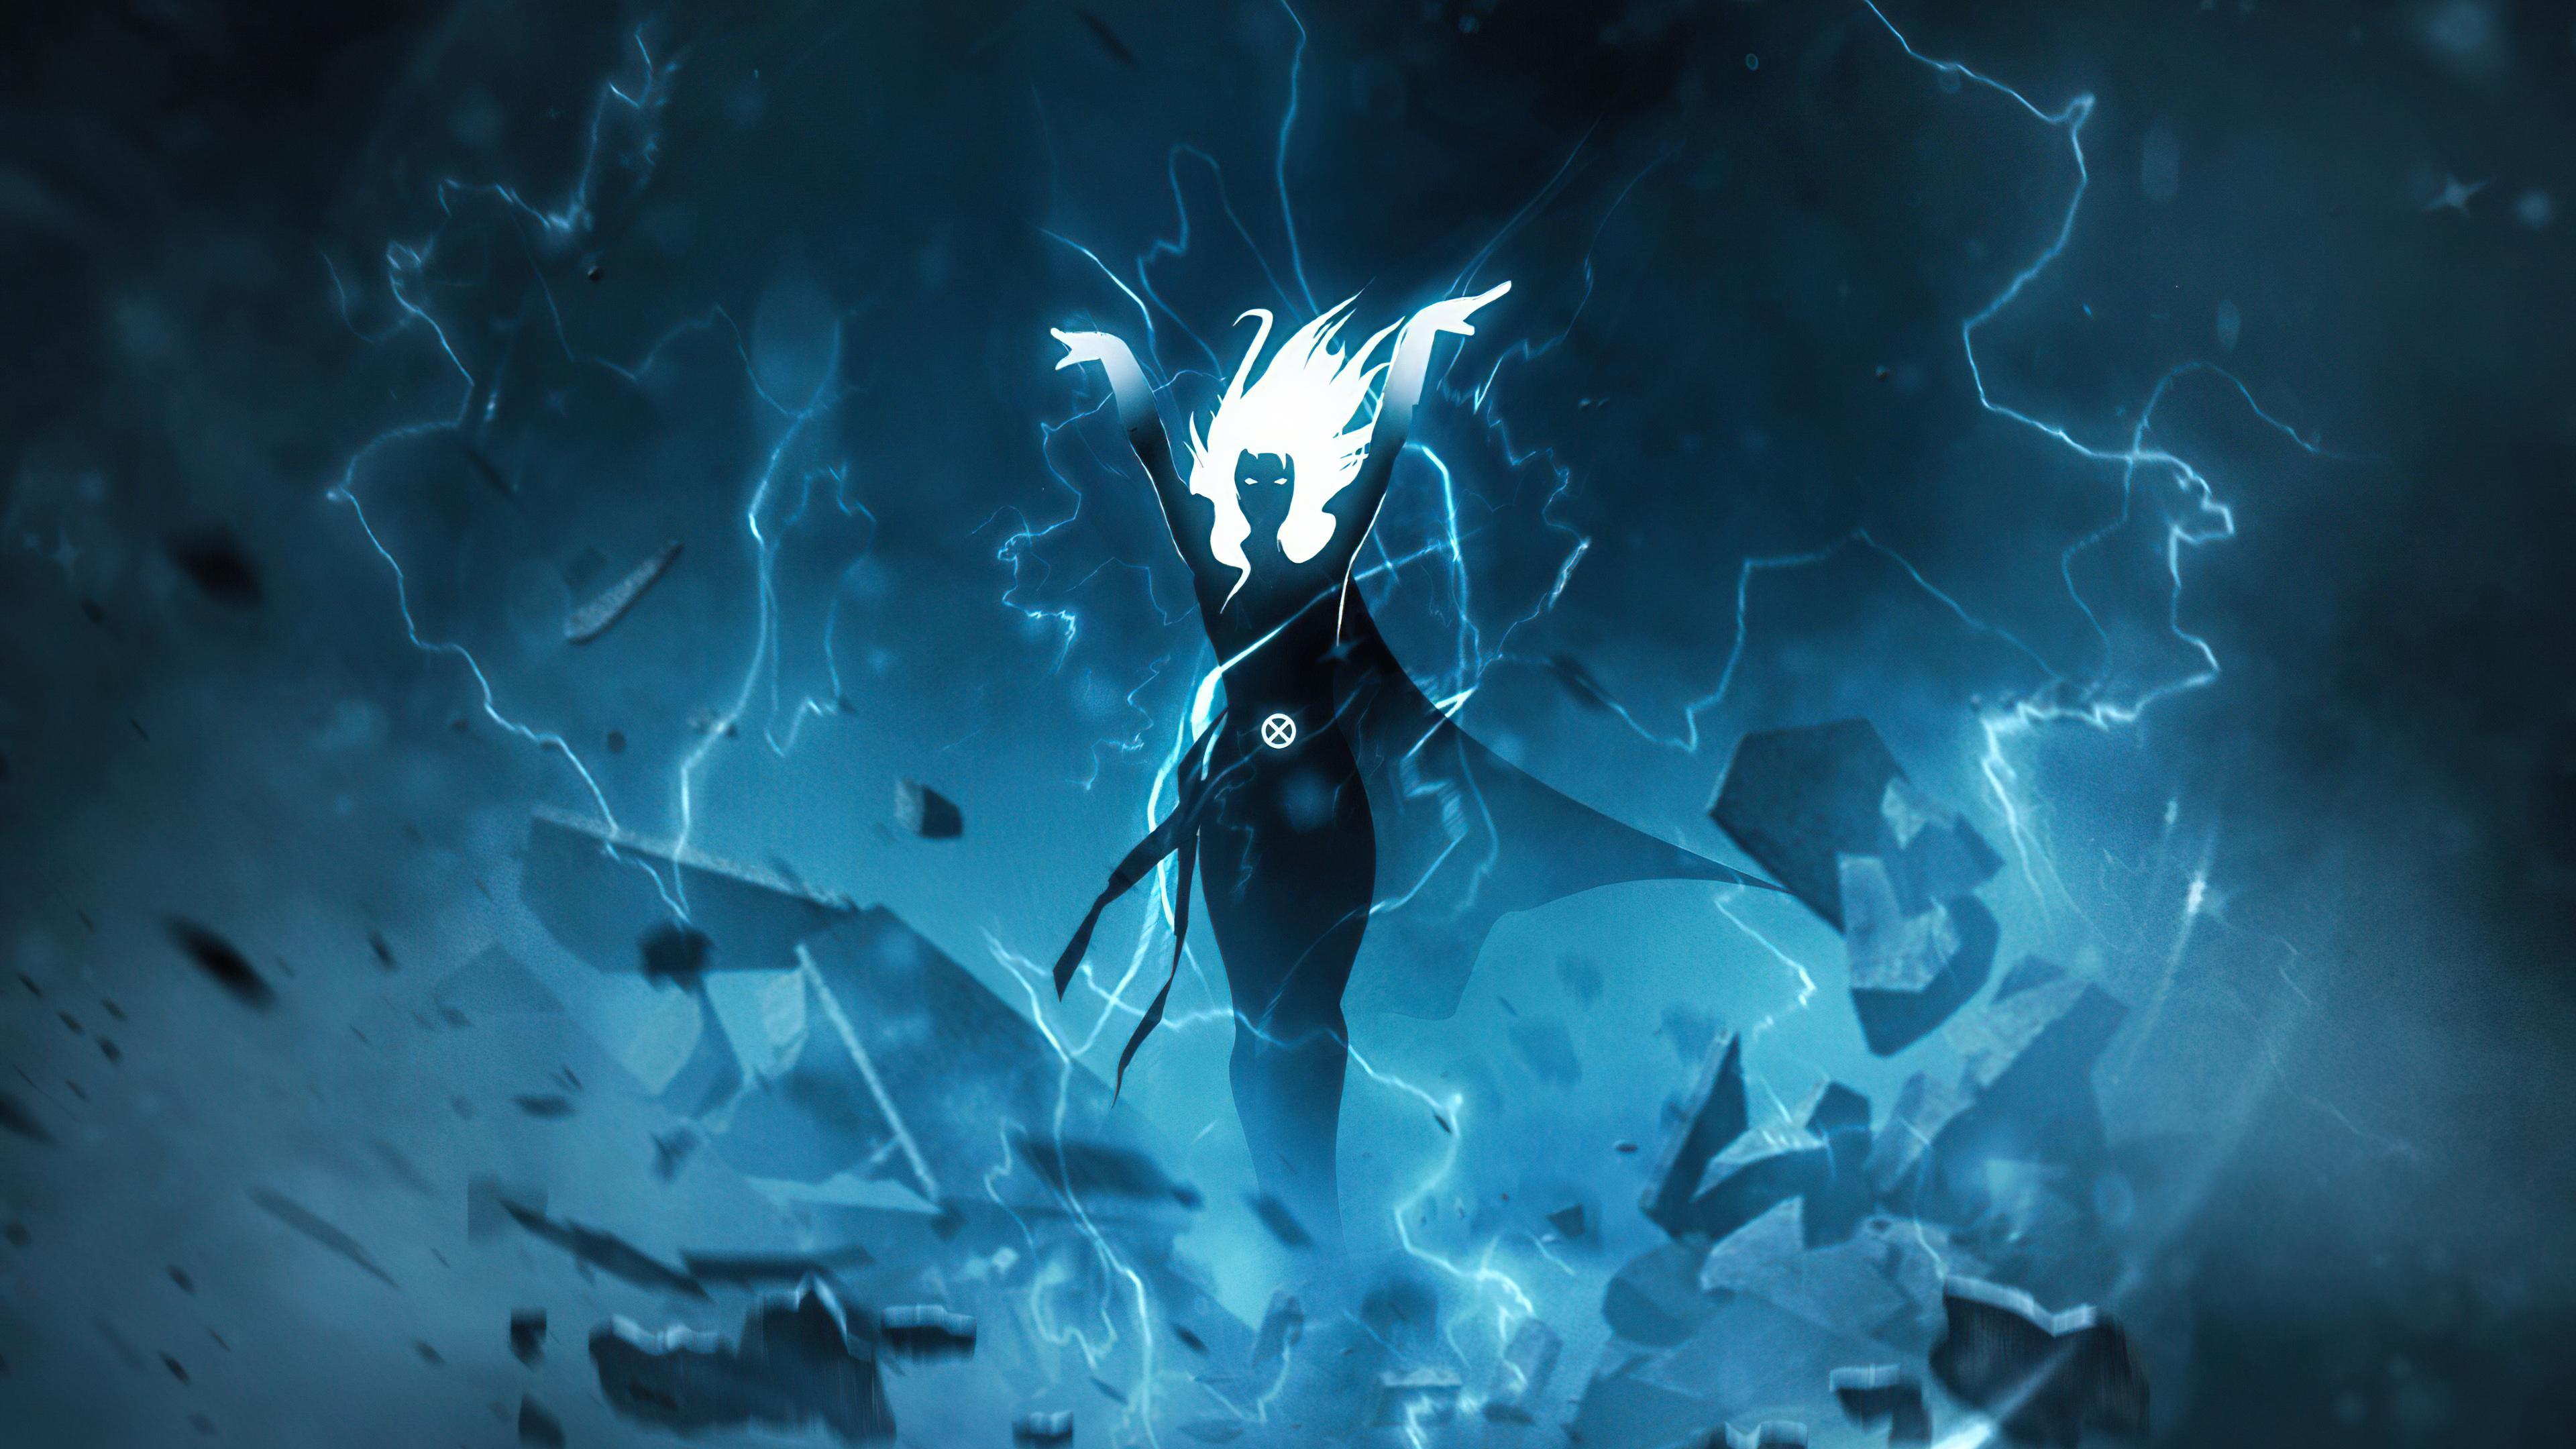 storm fictional superhero 4k 1619216109 - Storm Fictional Superhero 4k - Storm Fictional Superhero 4k wallpapers